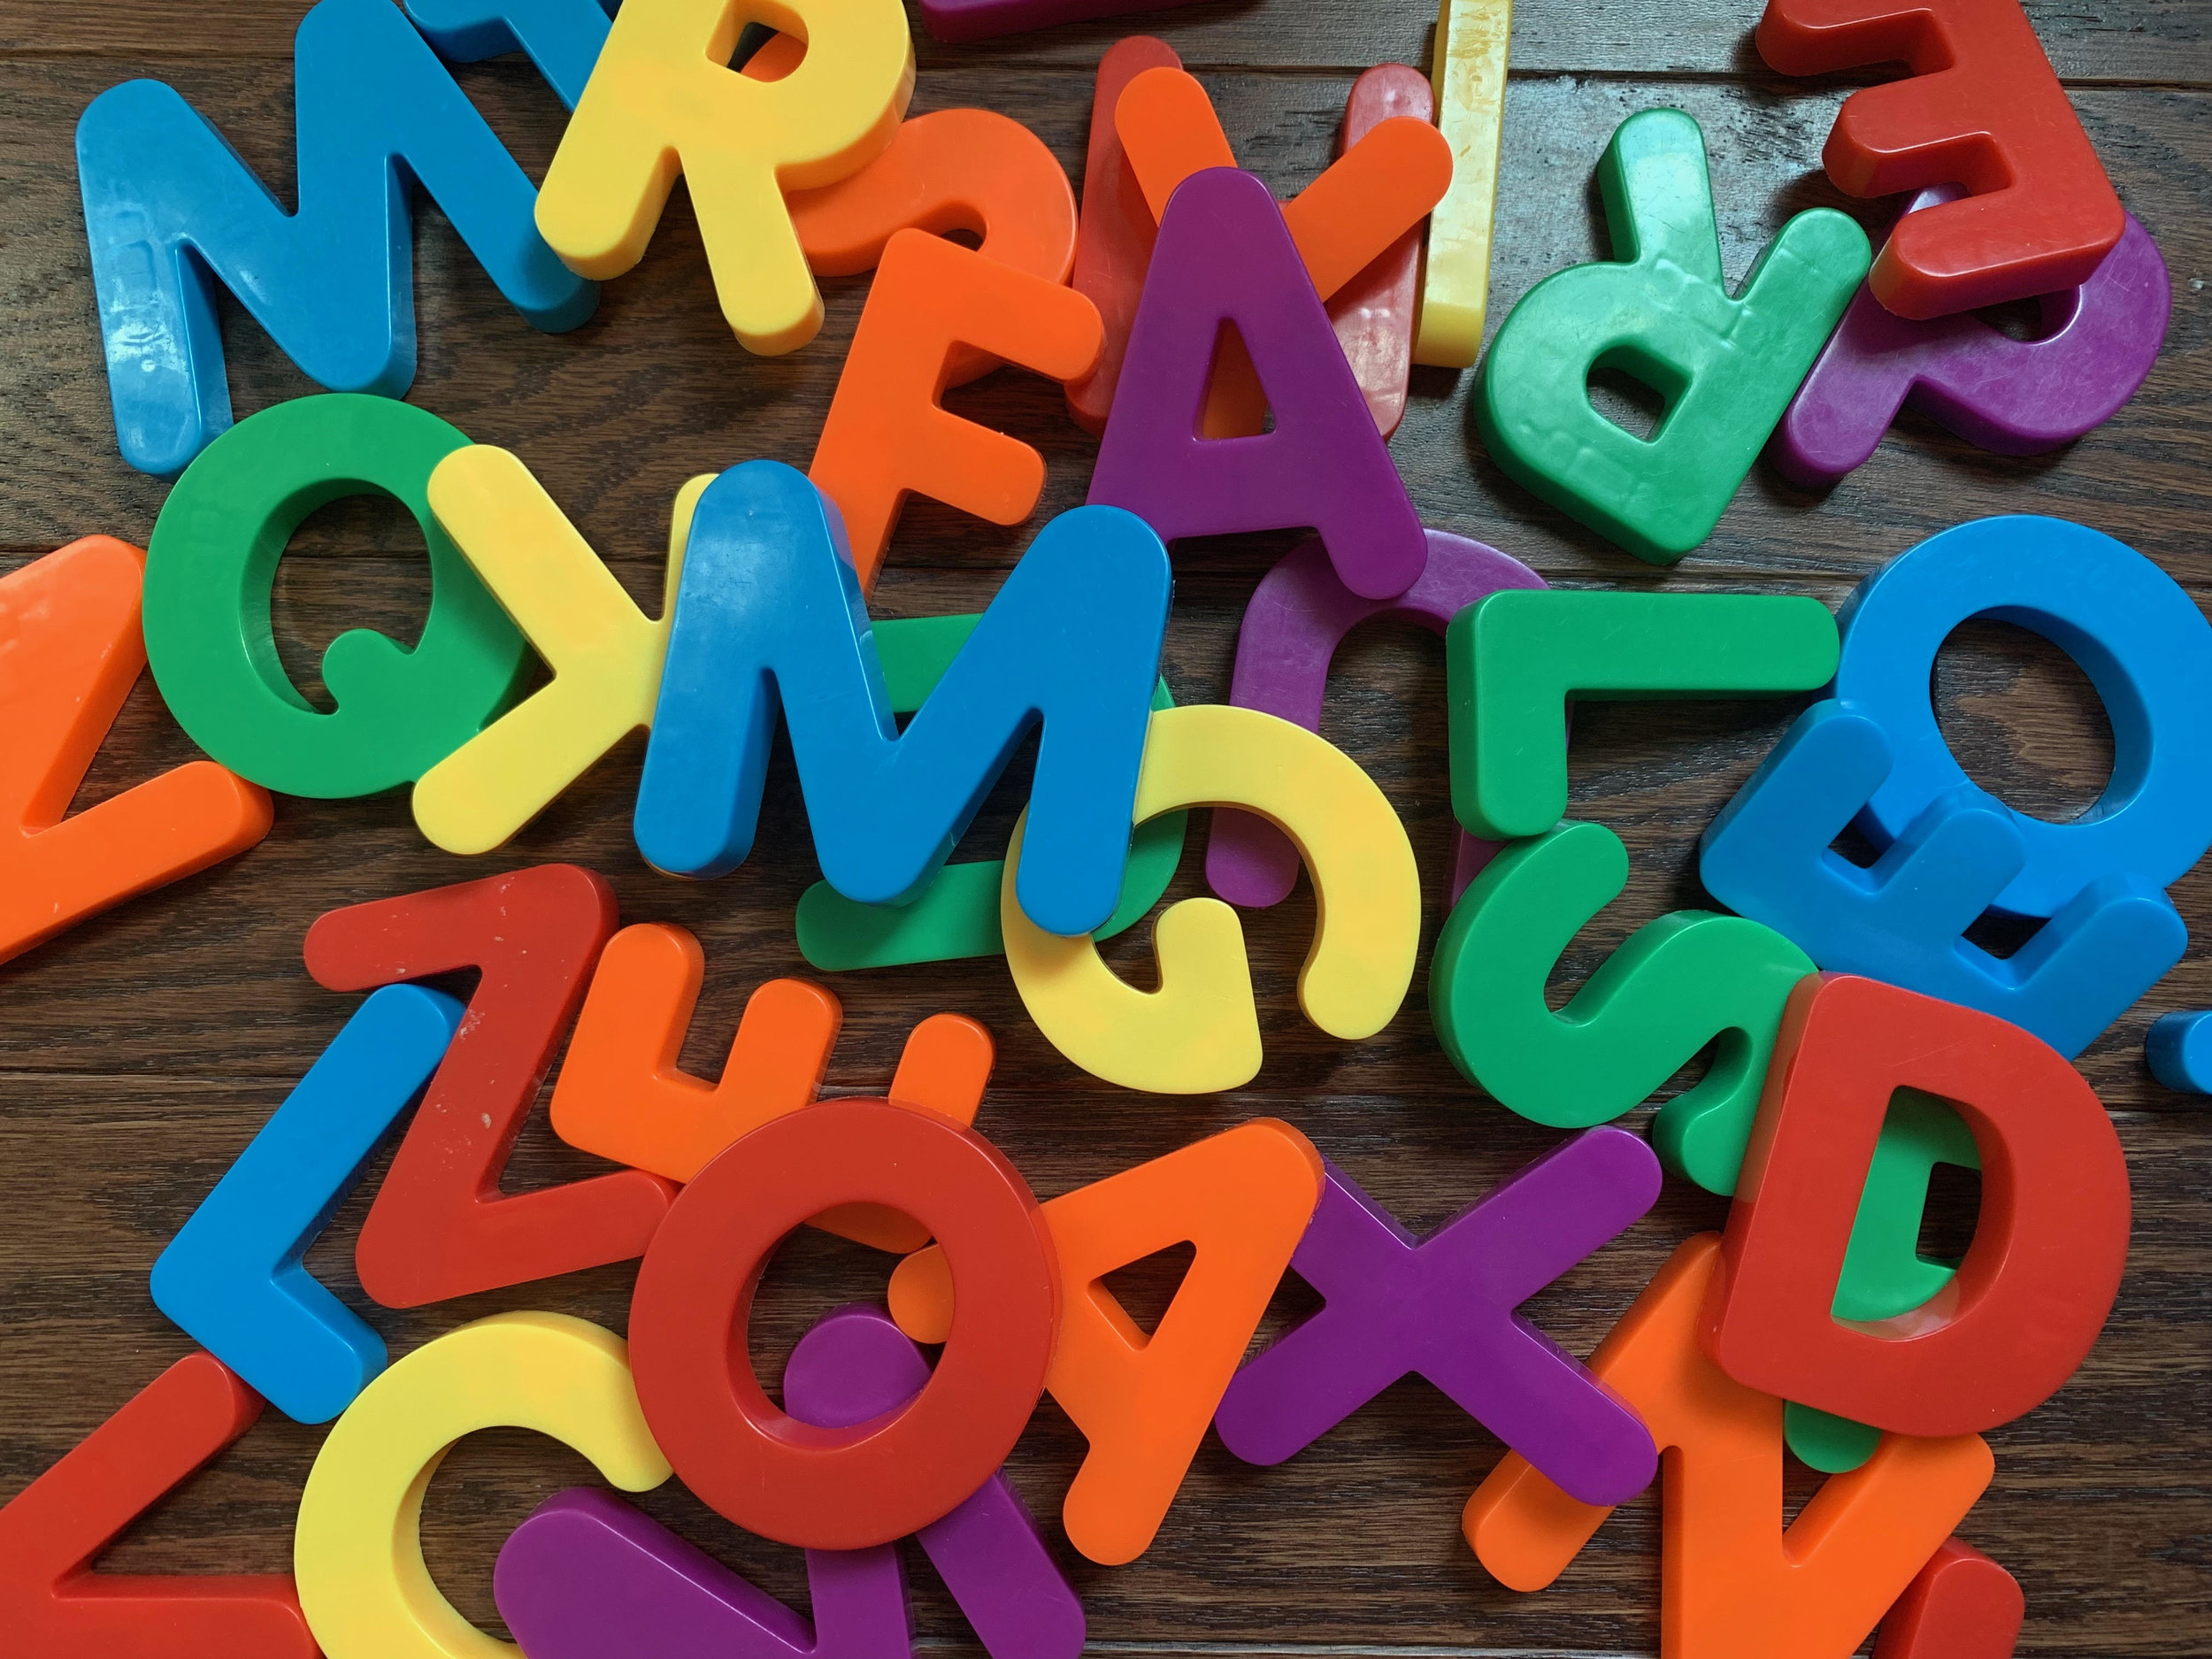 BestMomIdeas-Teaching ABCs.jpg